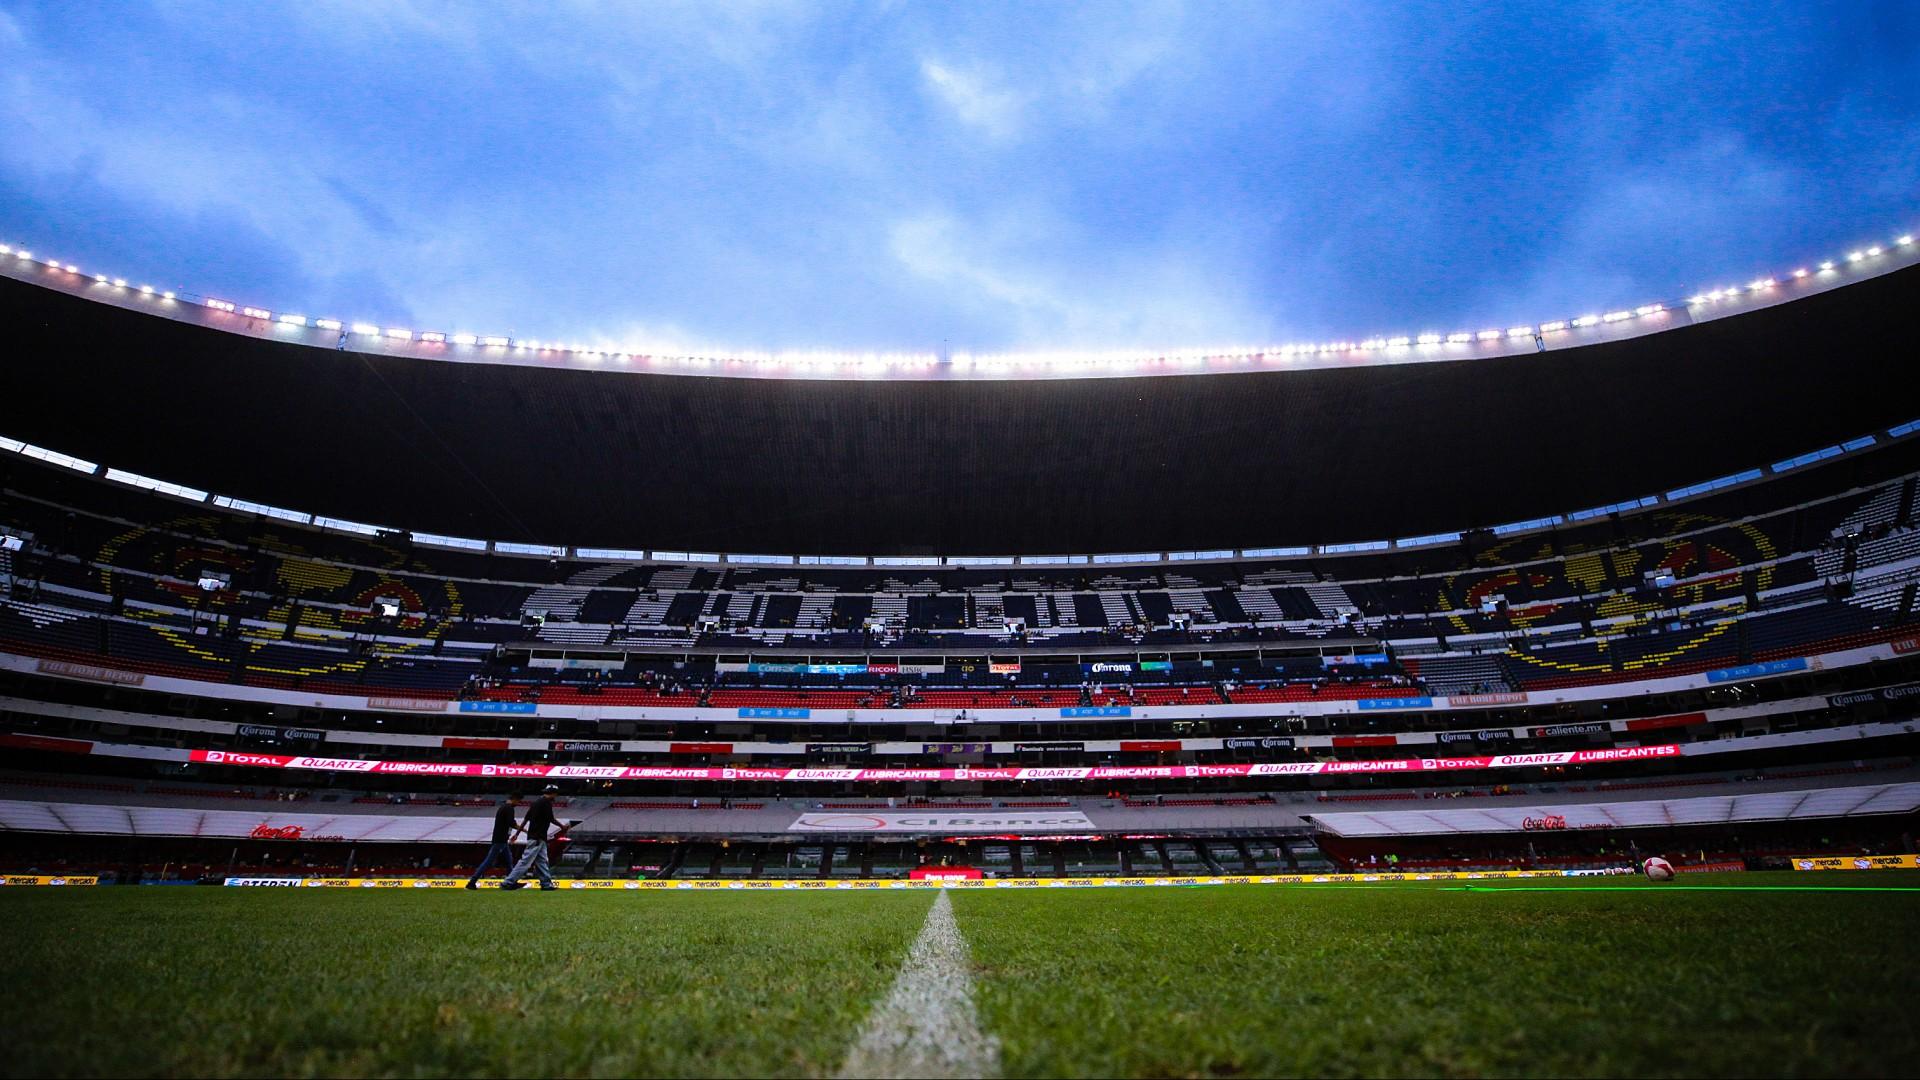 Azteca Stadium court was affected after concert